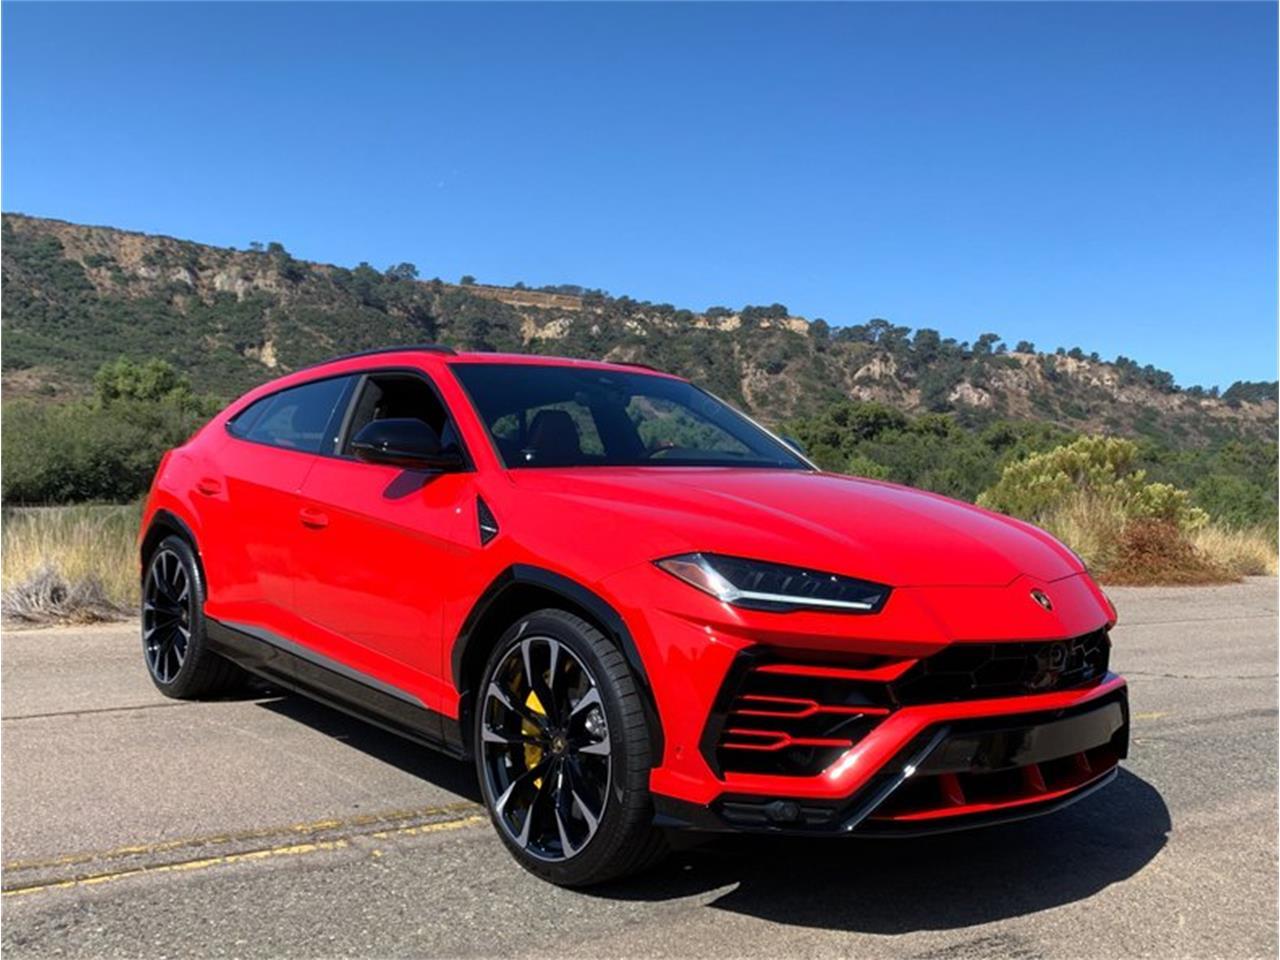 2019 Lamborghini Urus (CC-1262915) for sale in San Diego, California